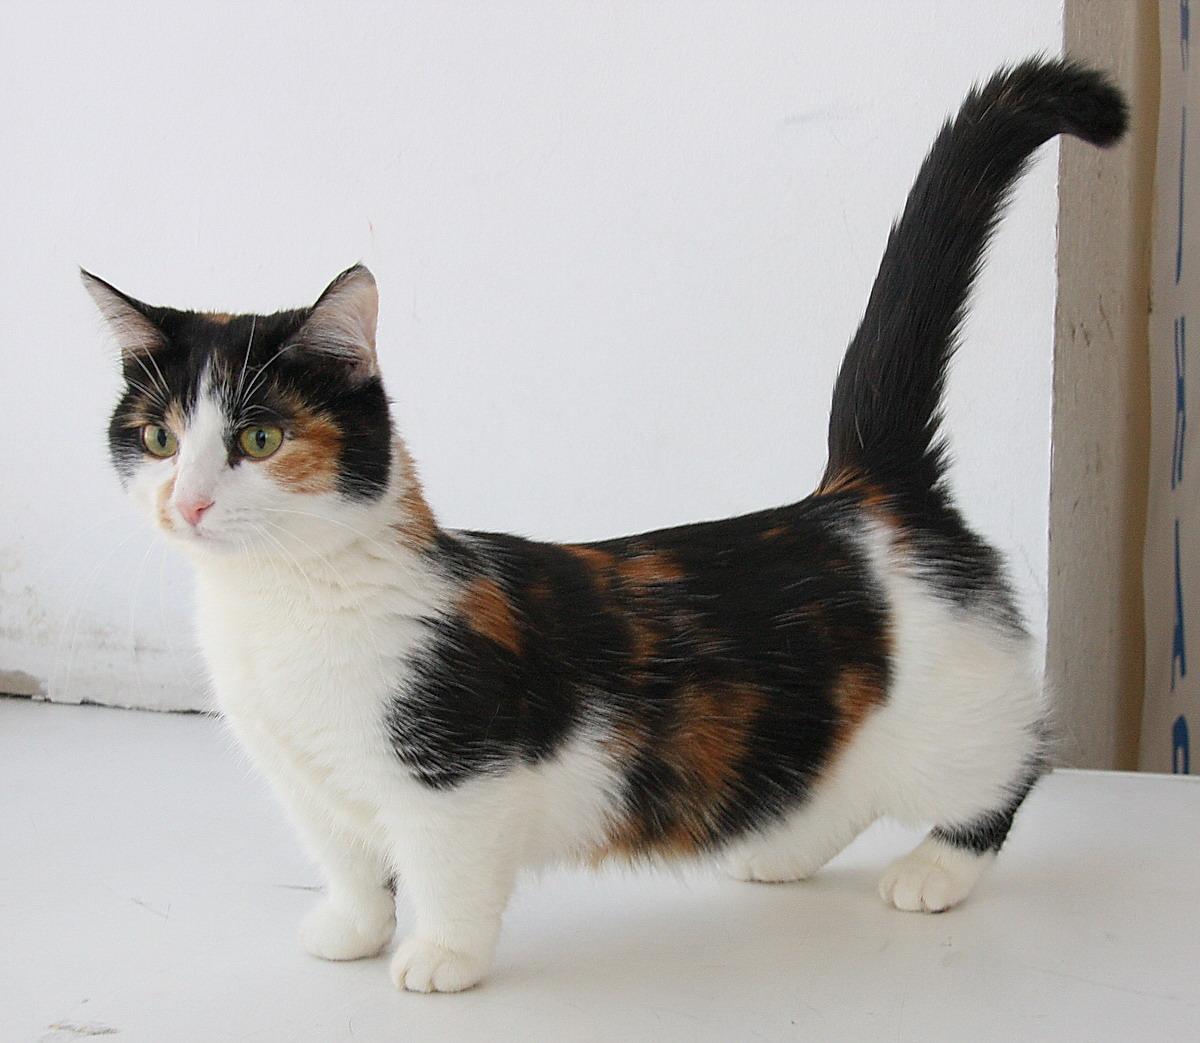 Фото пестрой кошки кот отжал